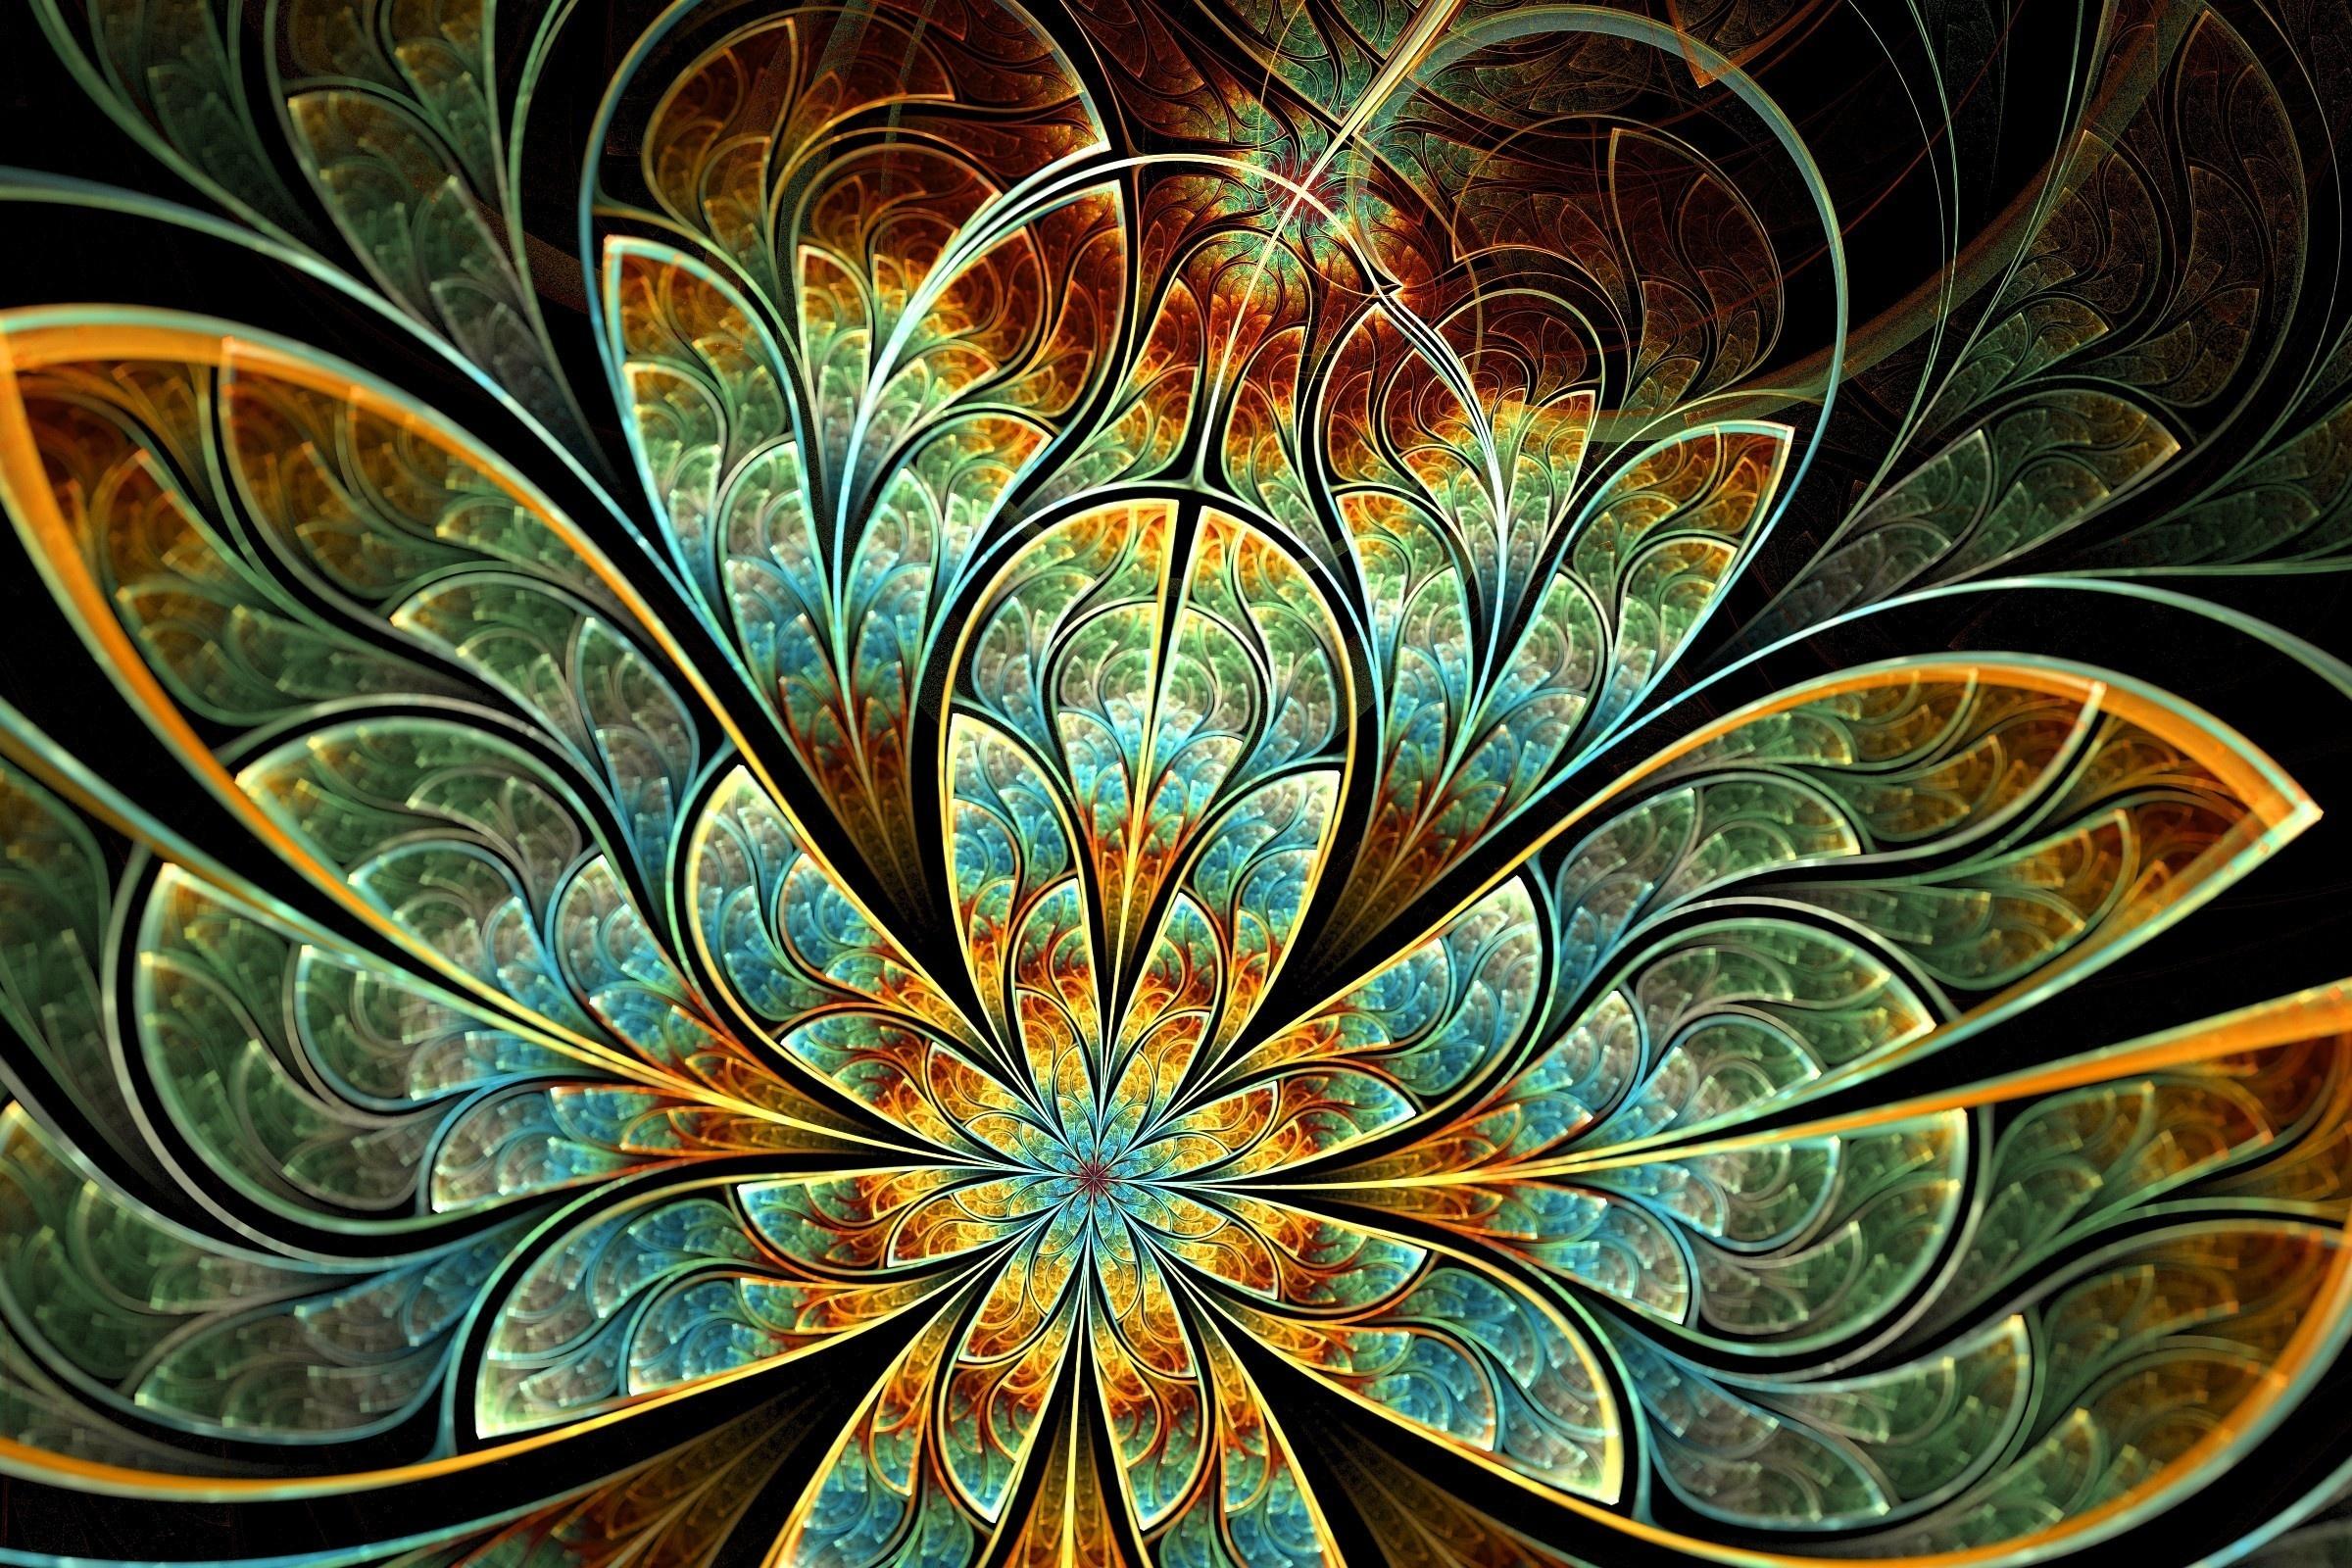 Fractal HD Wallpapers Backgrounds Wallpaper